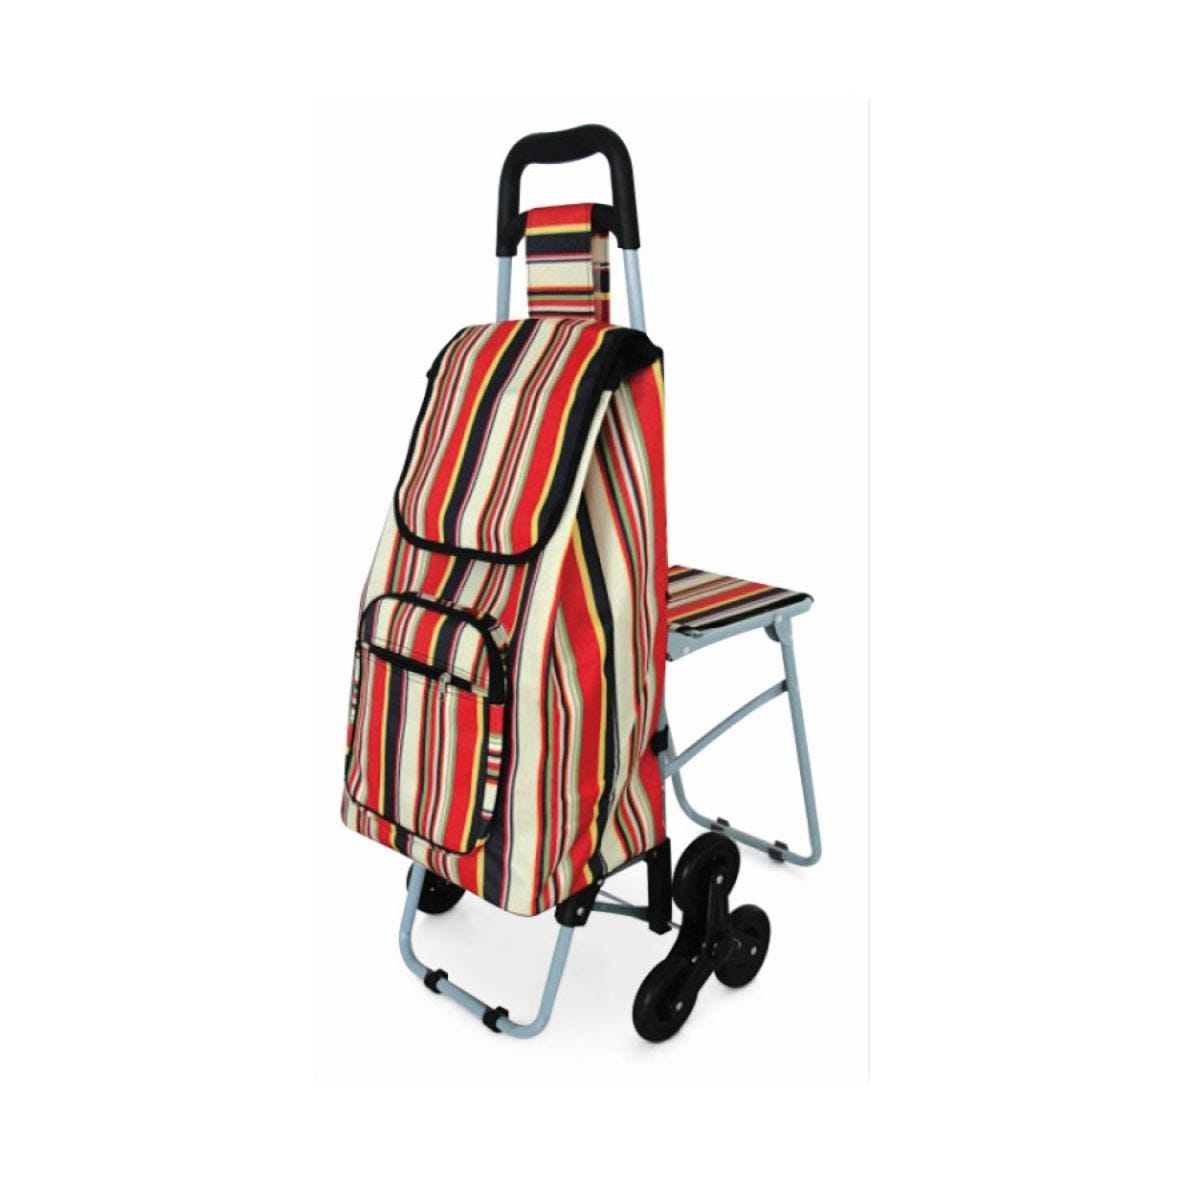 Lifemax Leisure Trolley